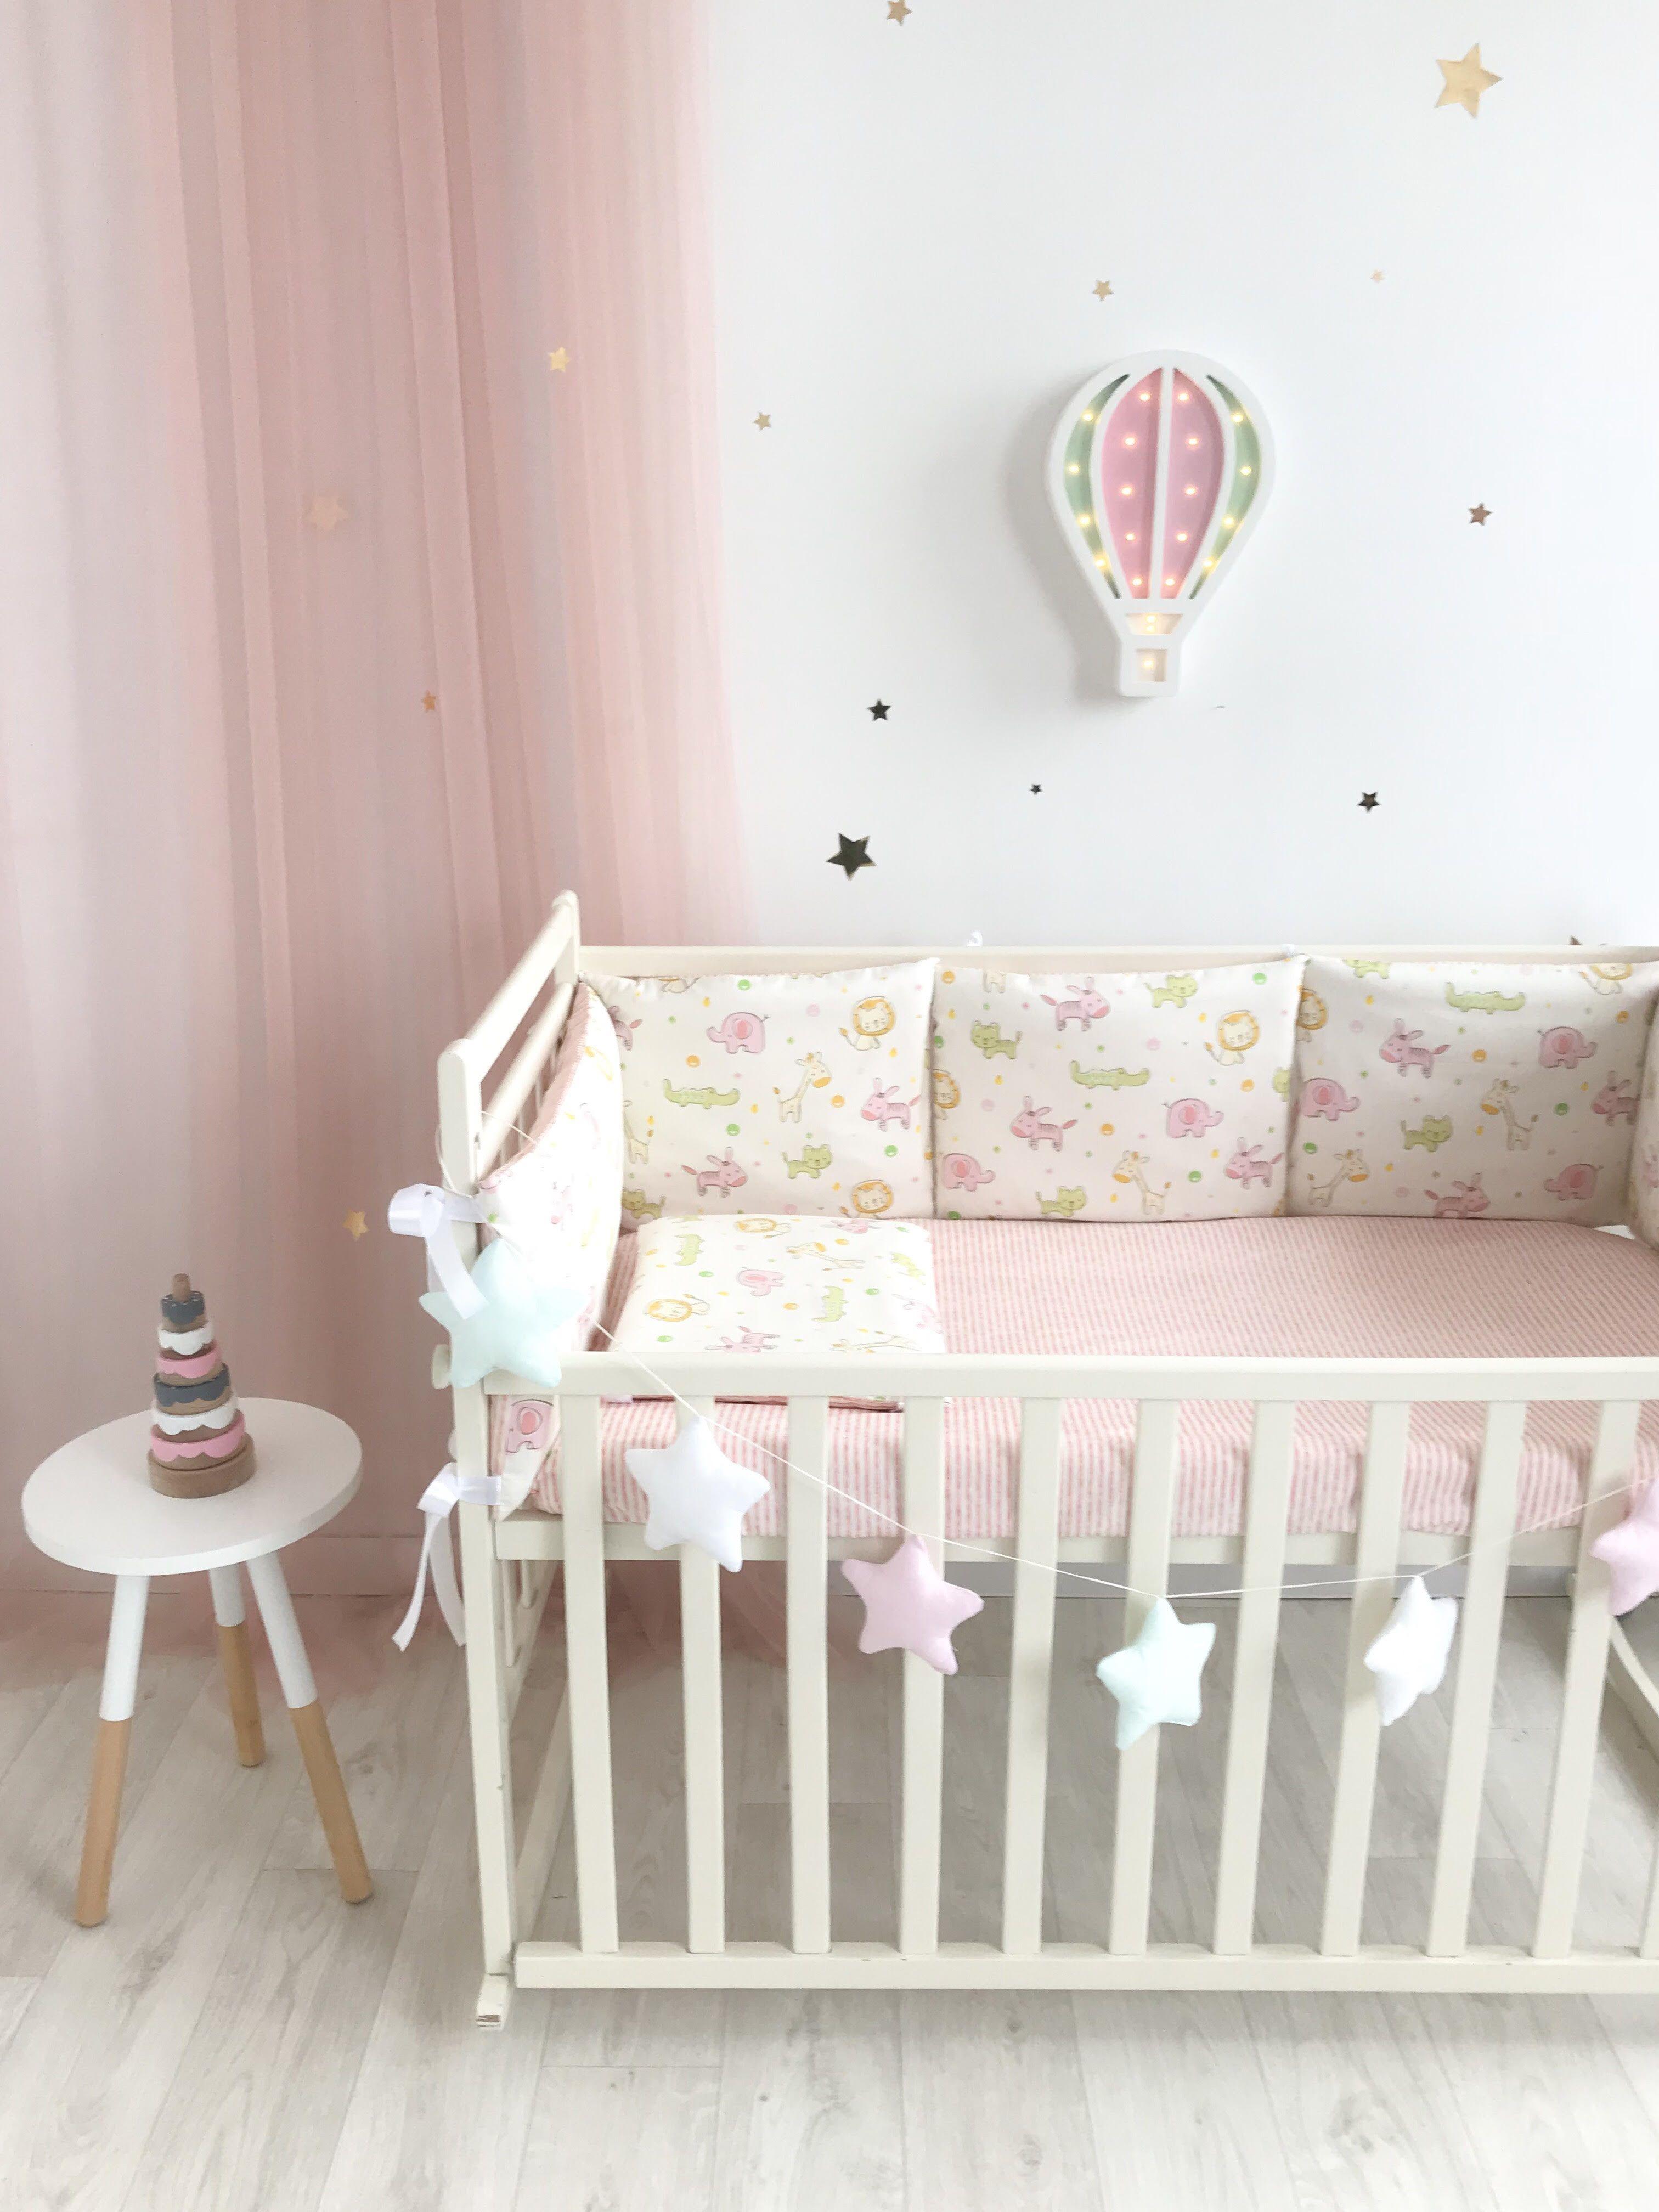 Nightlight Airbaloon Nursery Ideas Babyshower Mininmalistdecor Nurserybedroomdecor